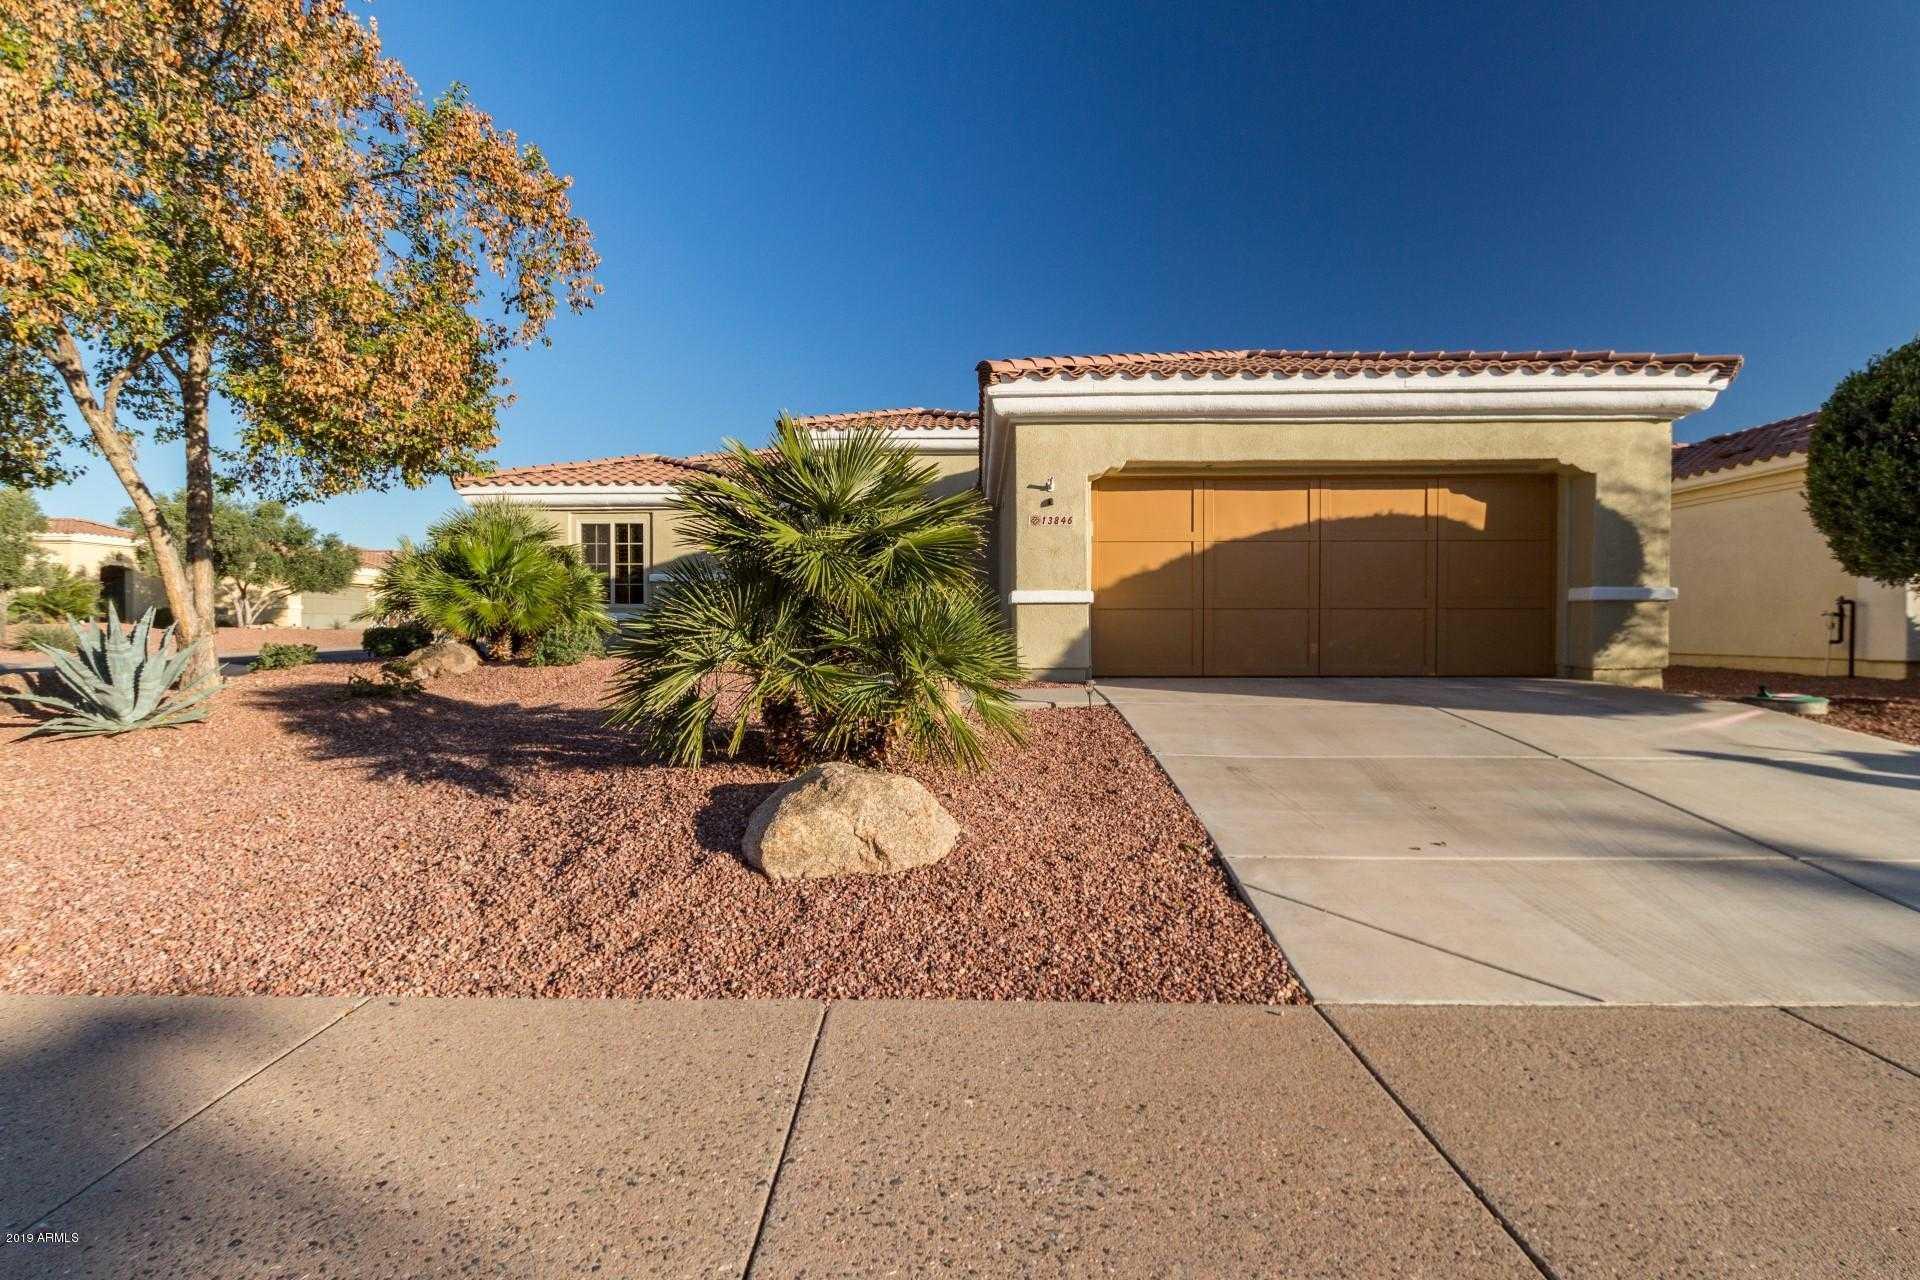 $334,900 - 2Br/2Ba - Home for Sale in Corte Bella Country Club Phase 3 Santa Barbara, Sun City West